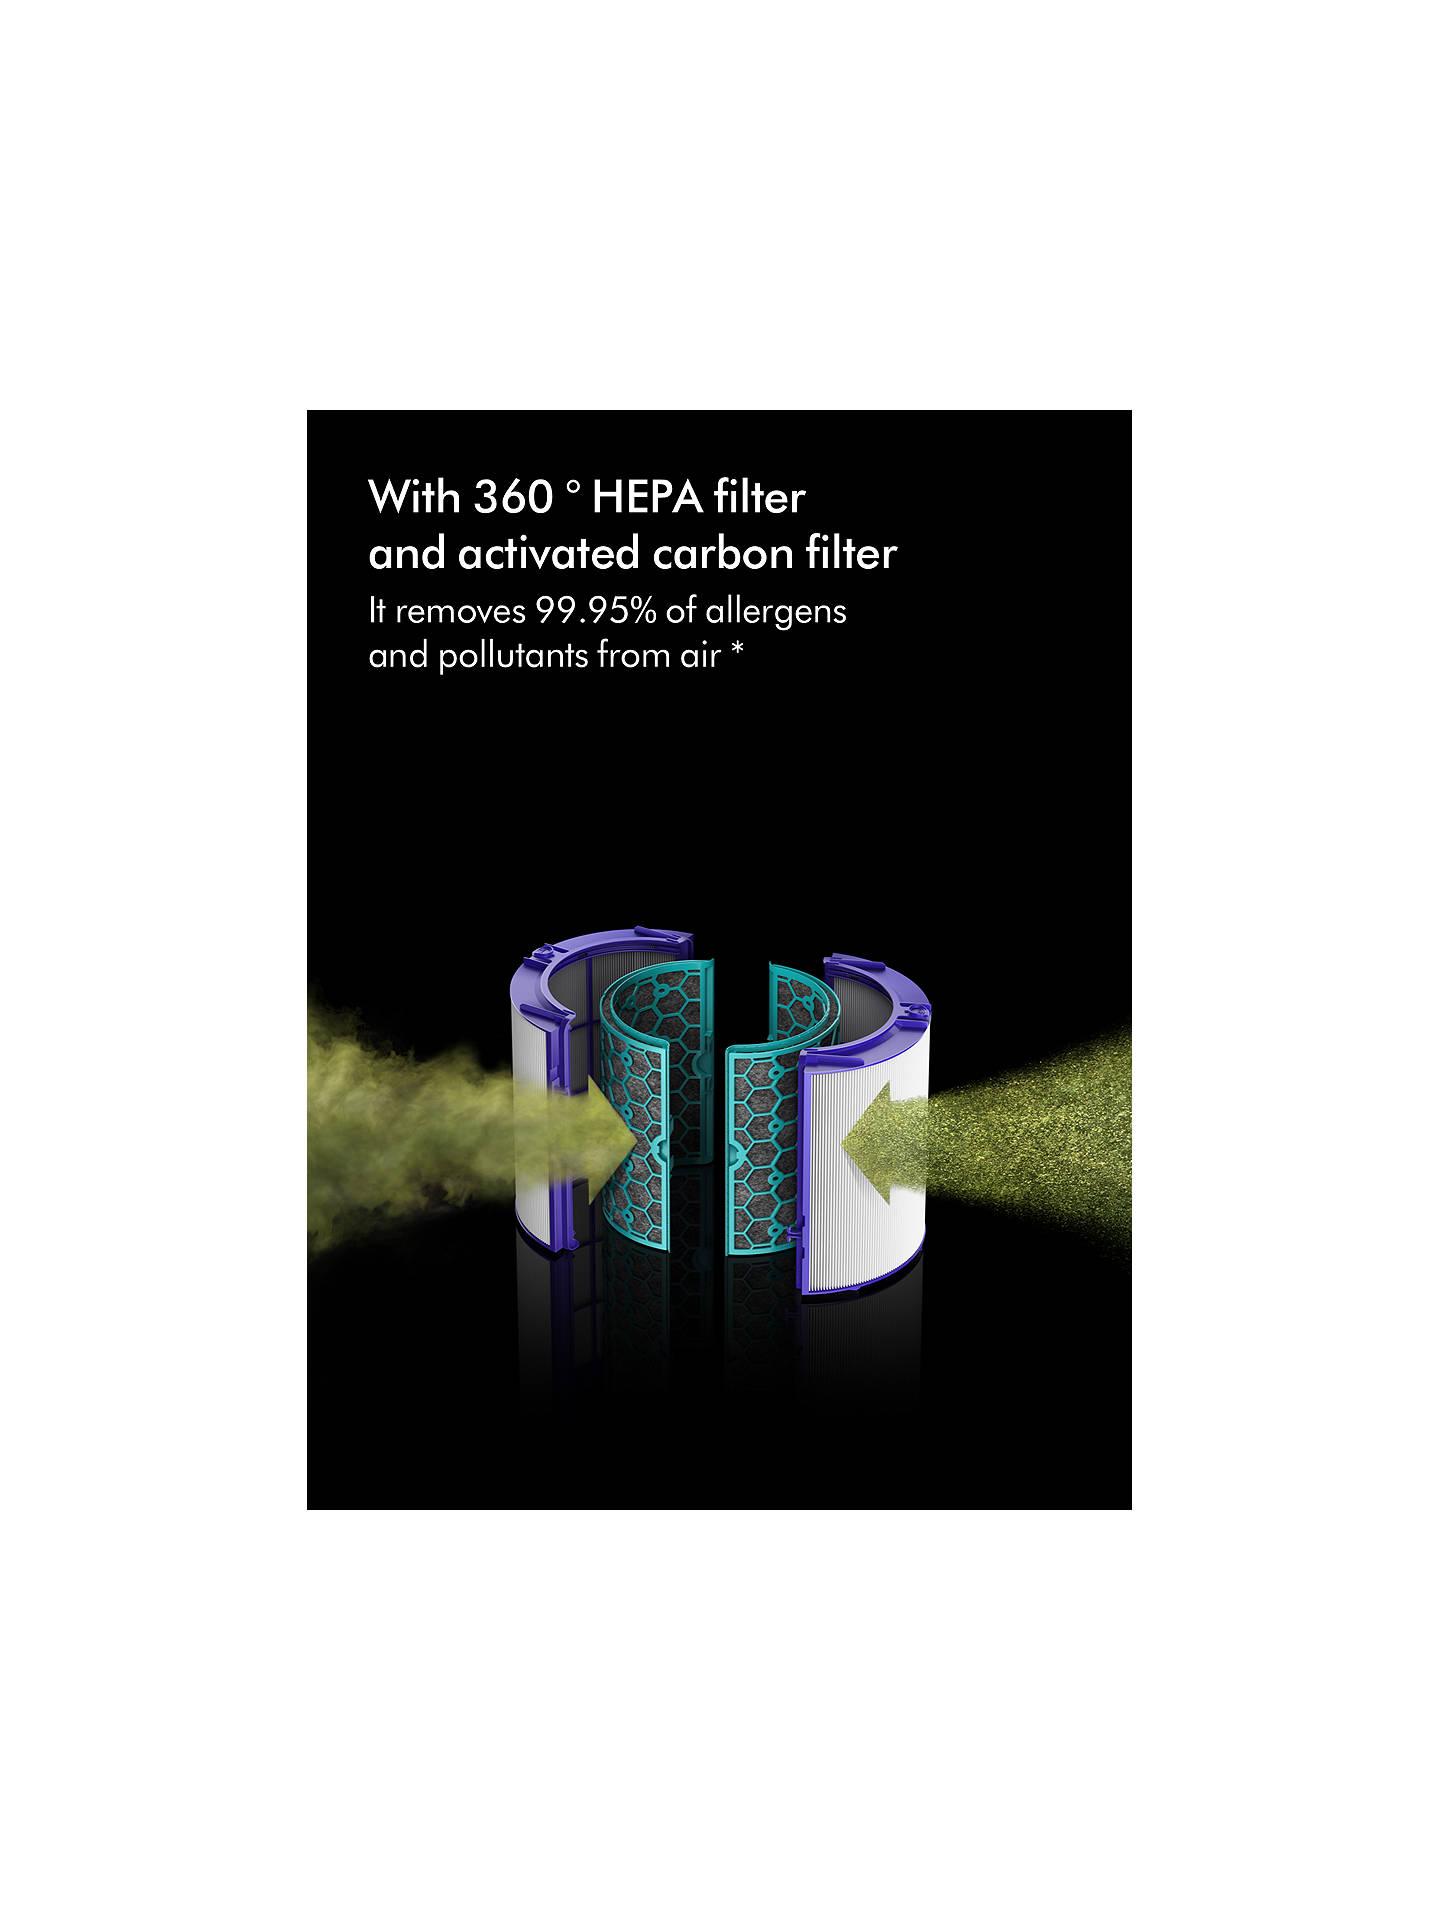 Dyson HP04 Pure Hot + Cool Fan Heater Air Purifier